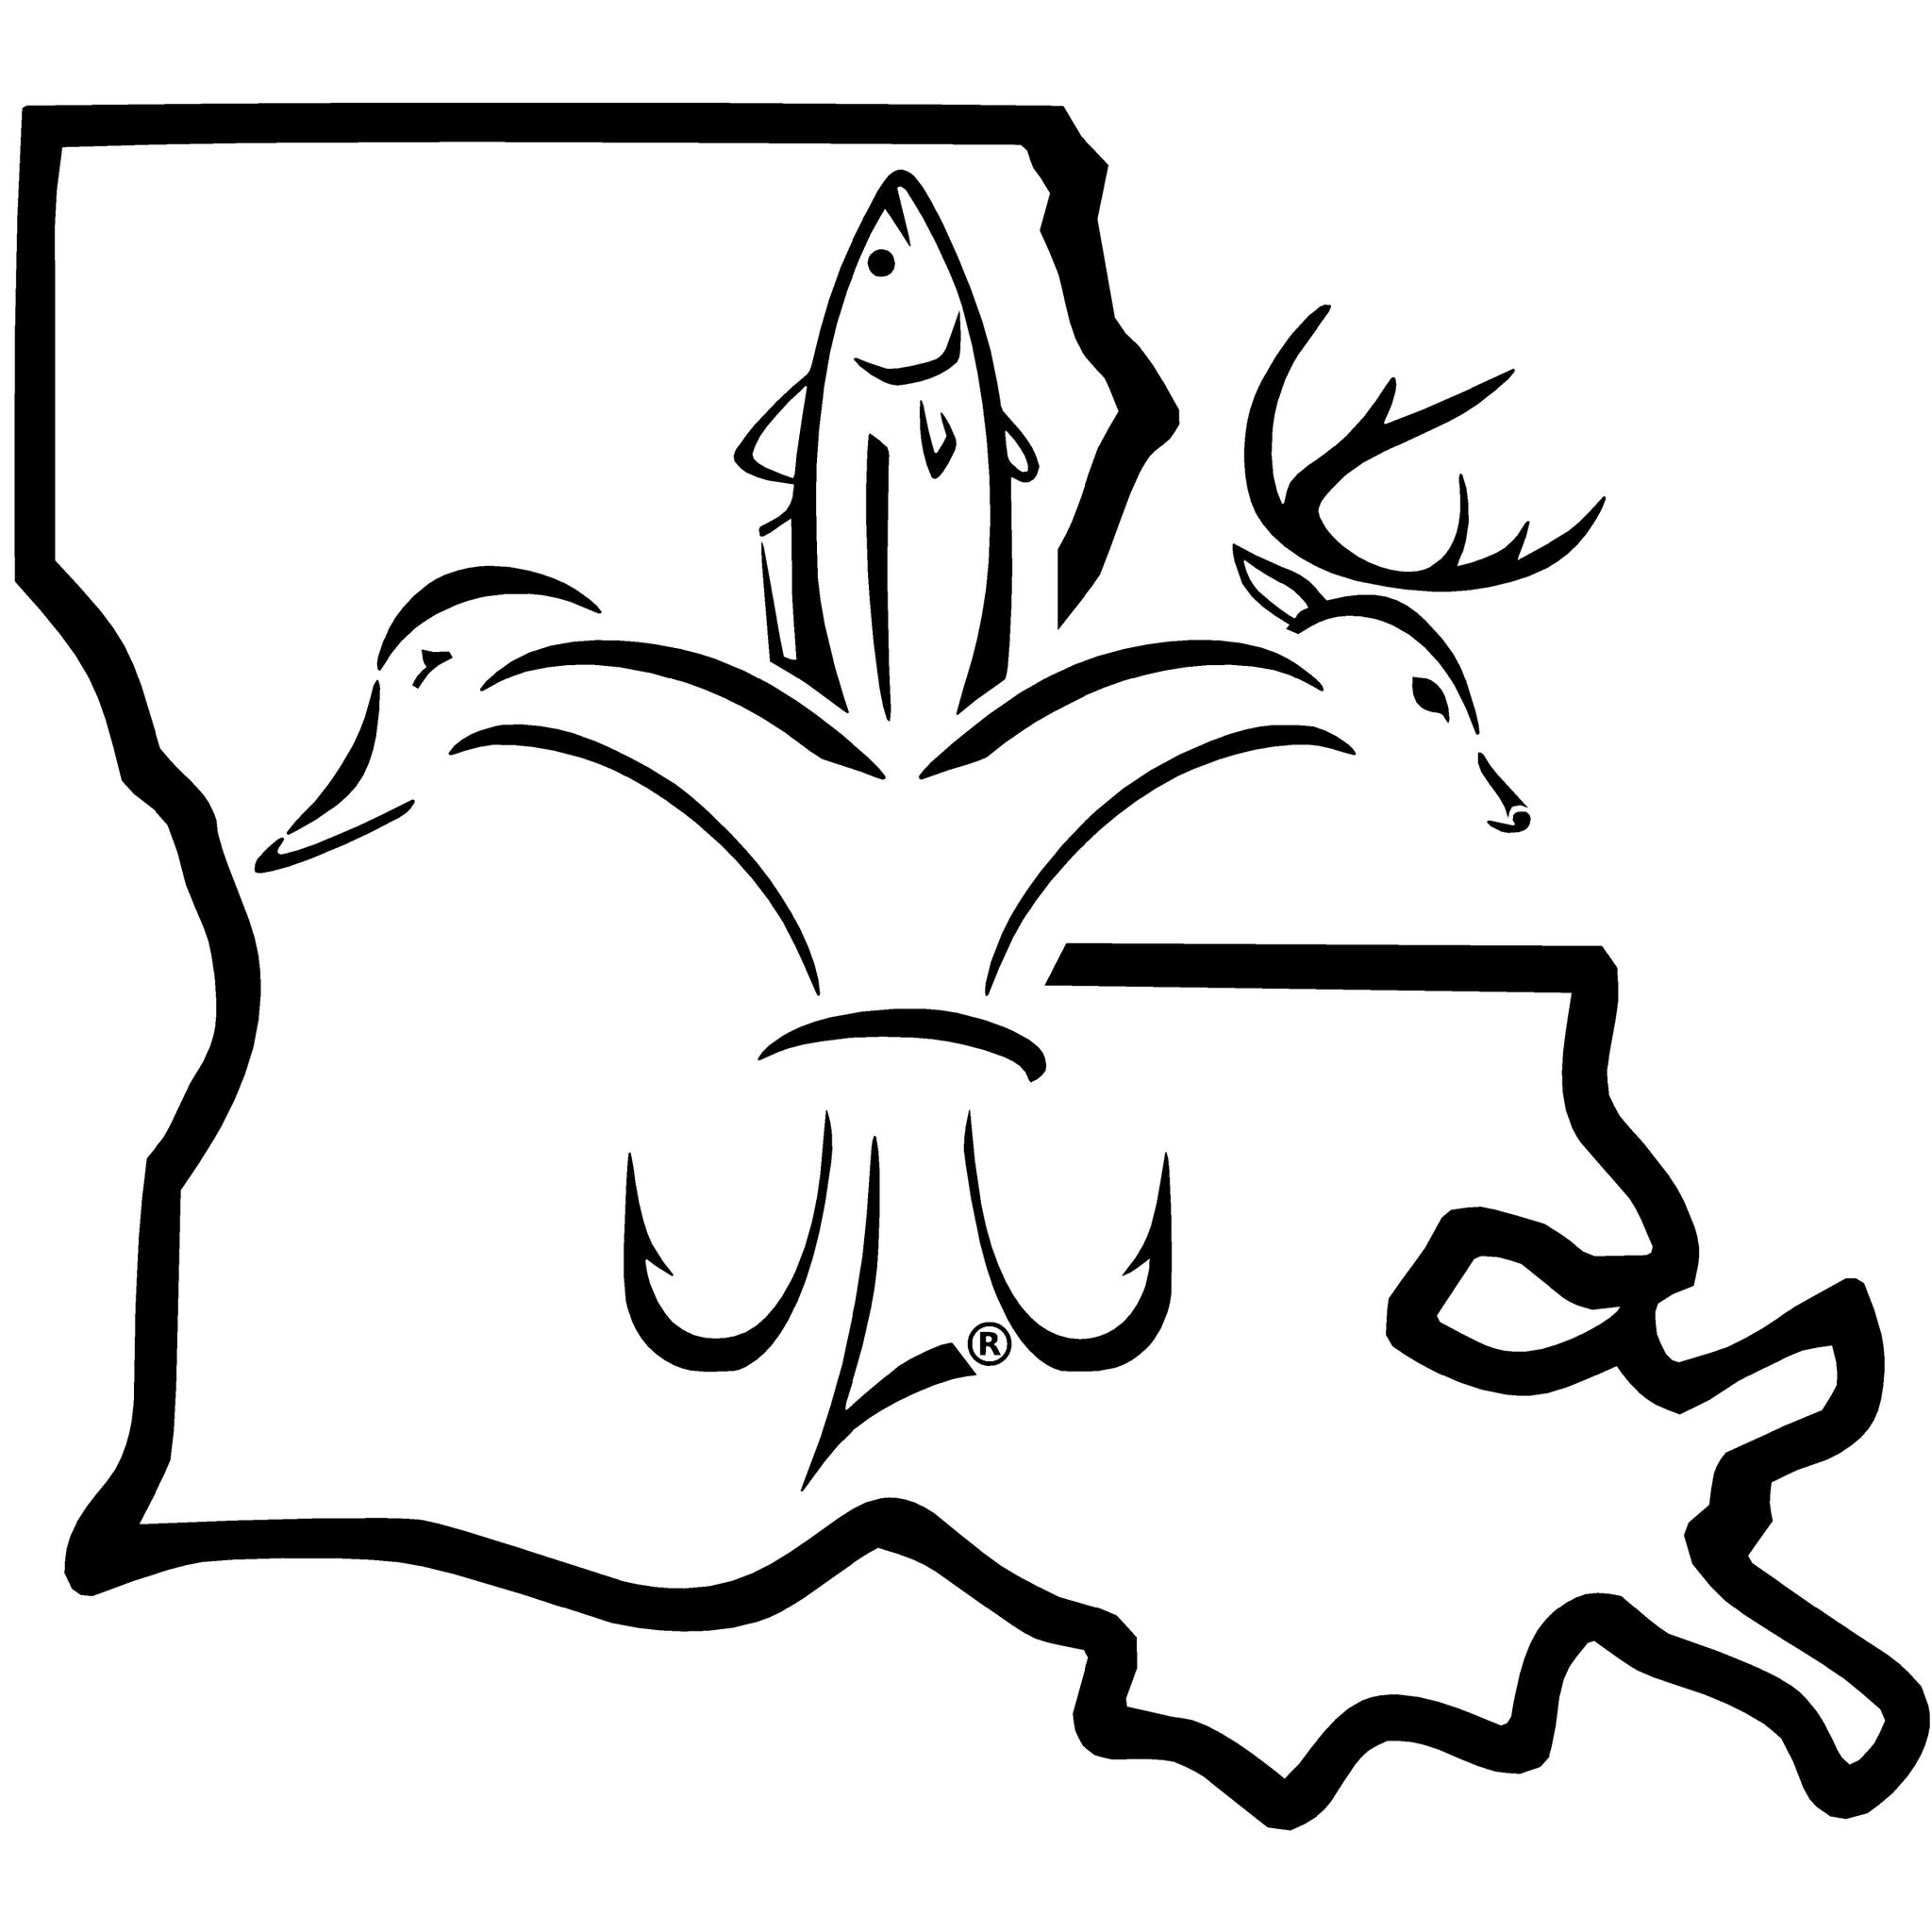 Louisiana Sportsman Decal | Cricut, Silhouettes and Fish